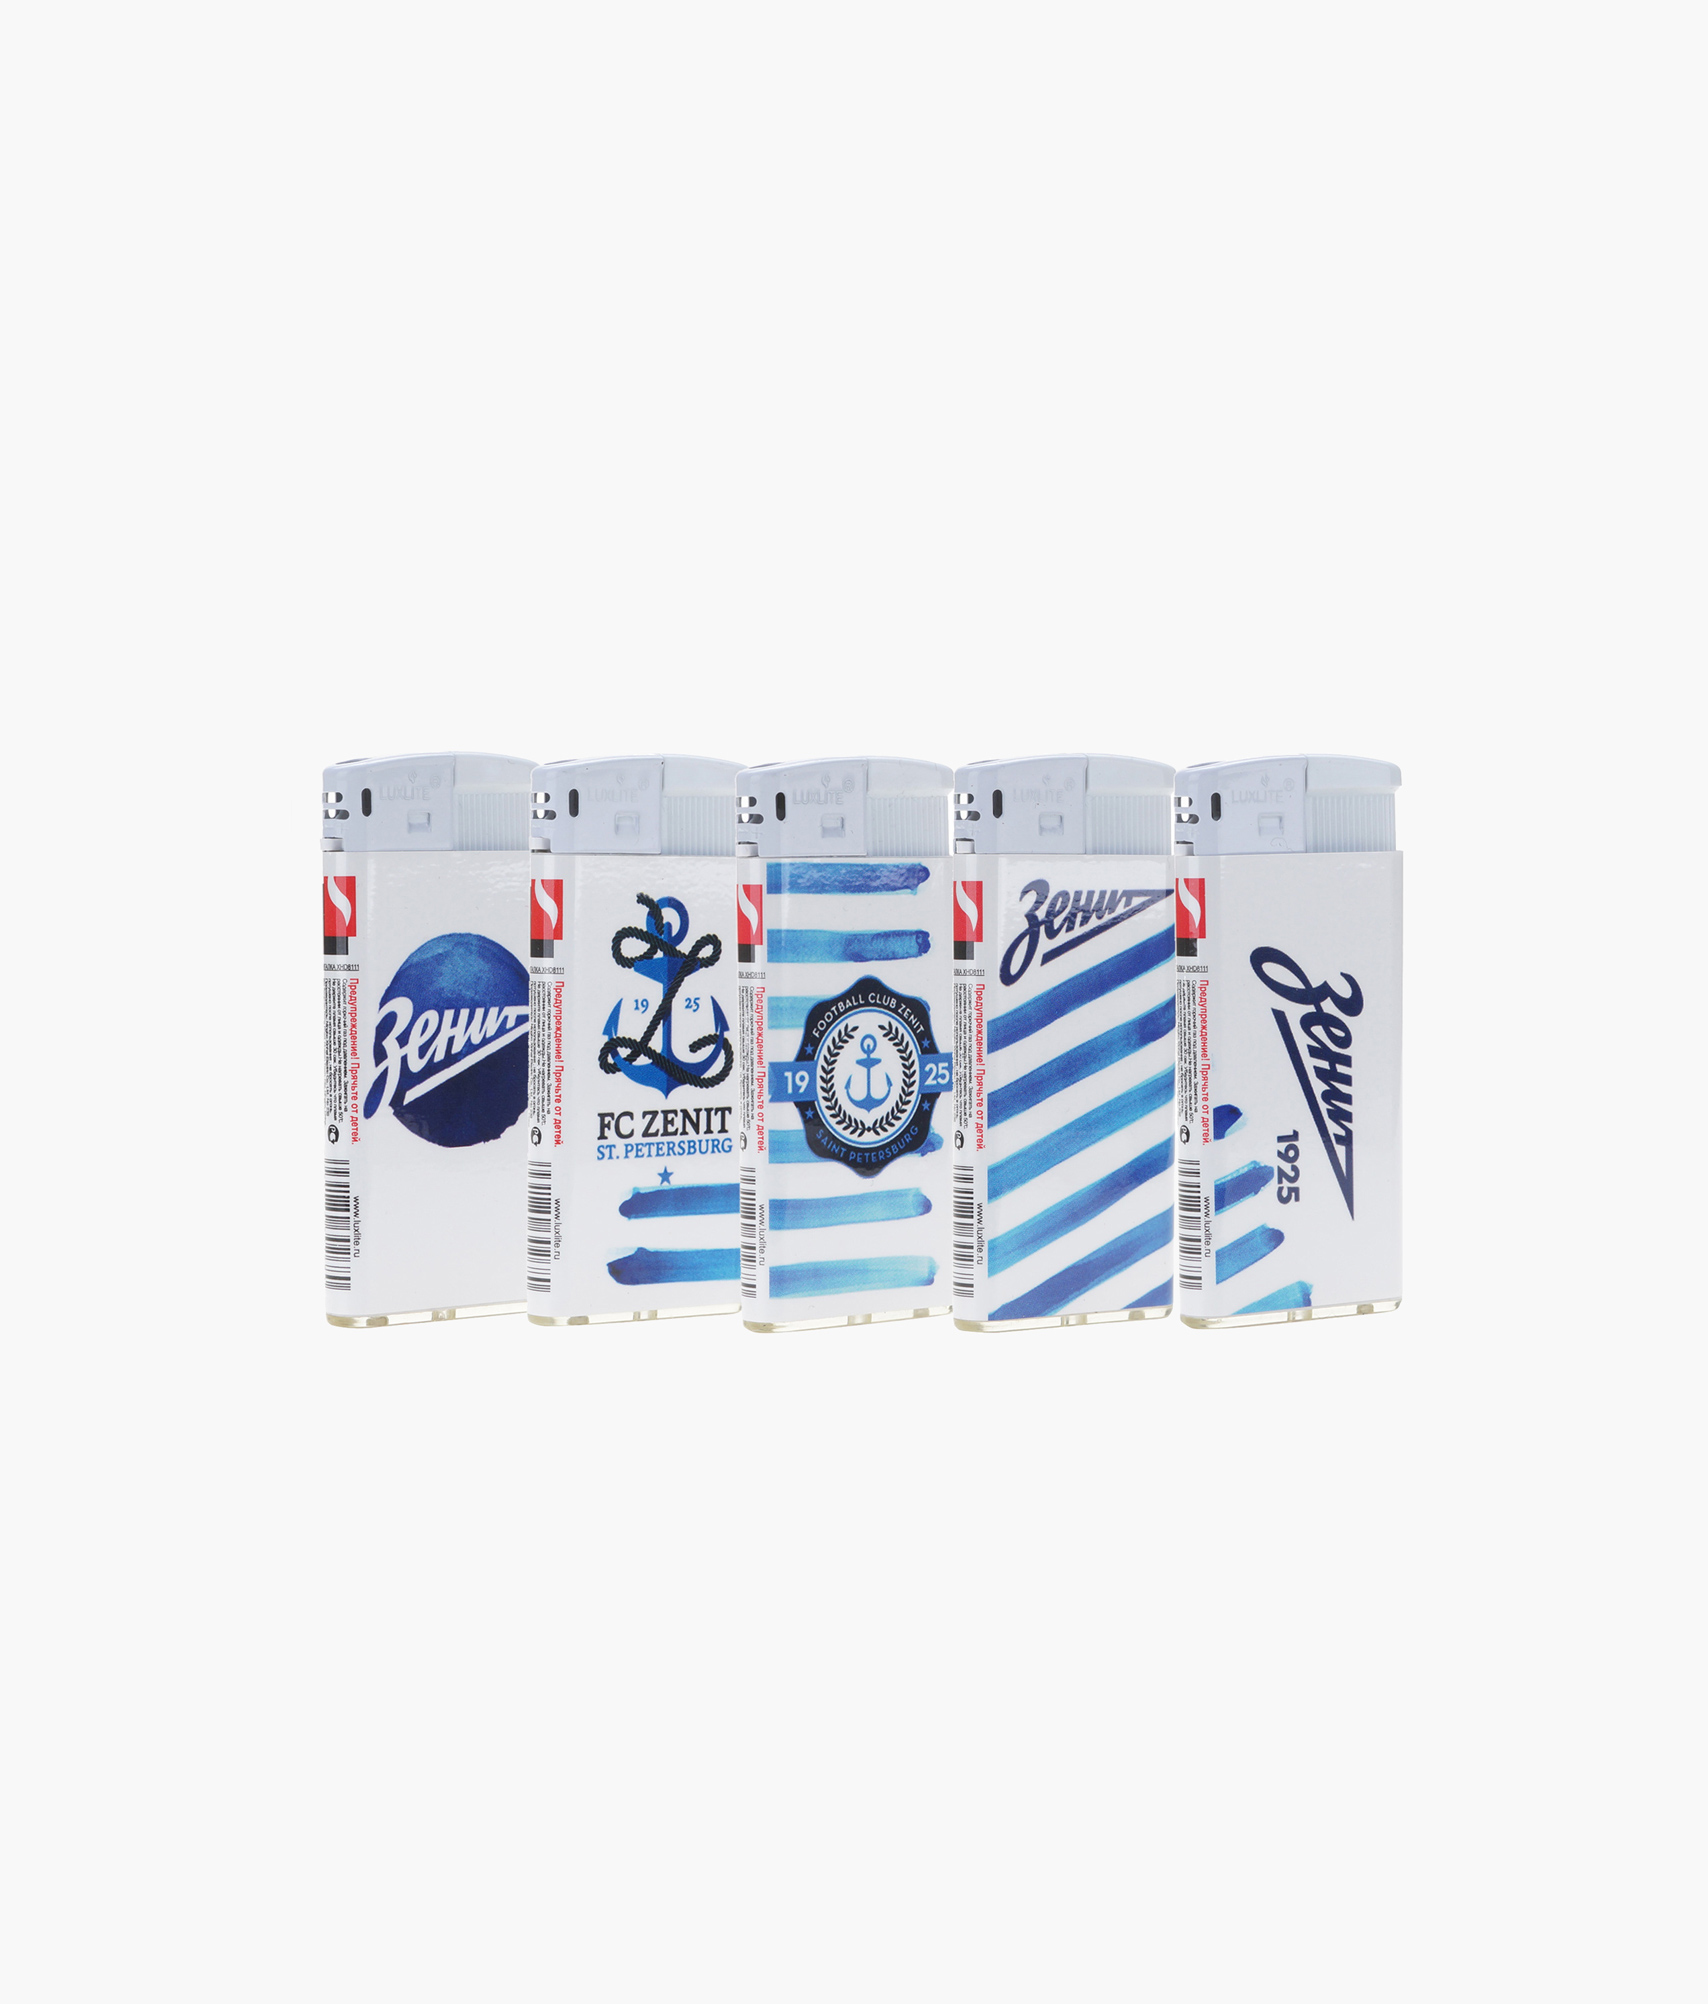 Зажигалка «Зенит» Зенит аксессуар для игровой консоли rainbo накладки на стики для геймпада зенит